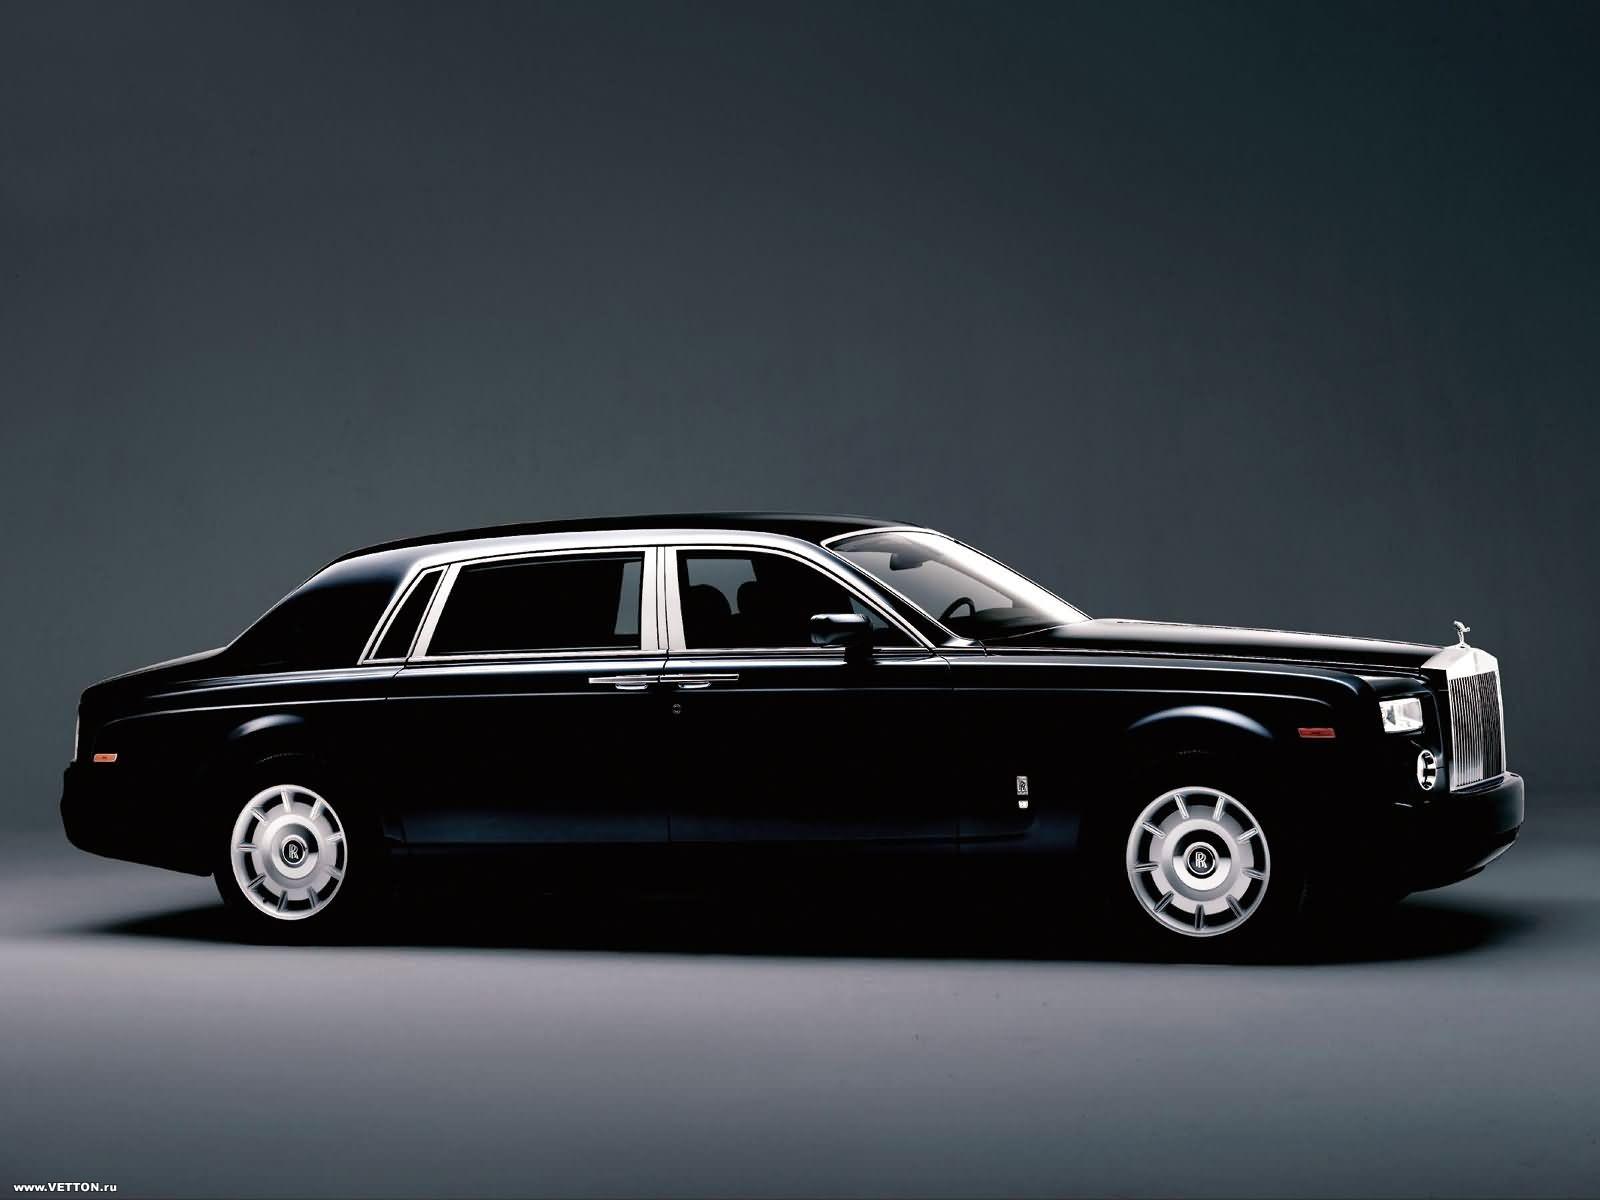 Mercedes Benz Logo >> ilona wallpapers: Royal Royals Car Wallpapers Latest 2011 ...